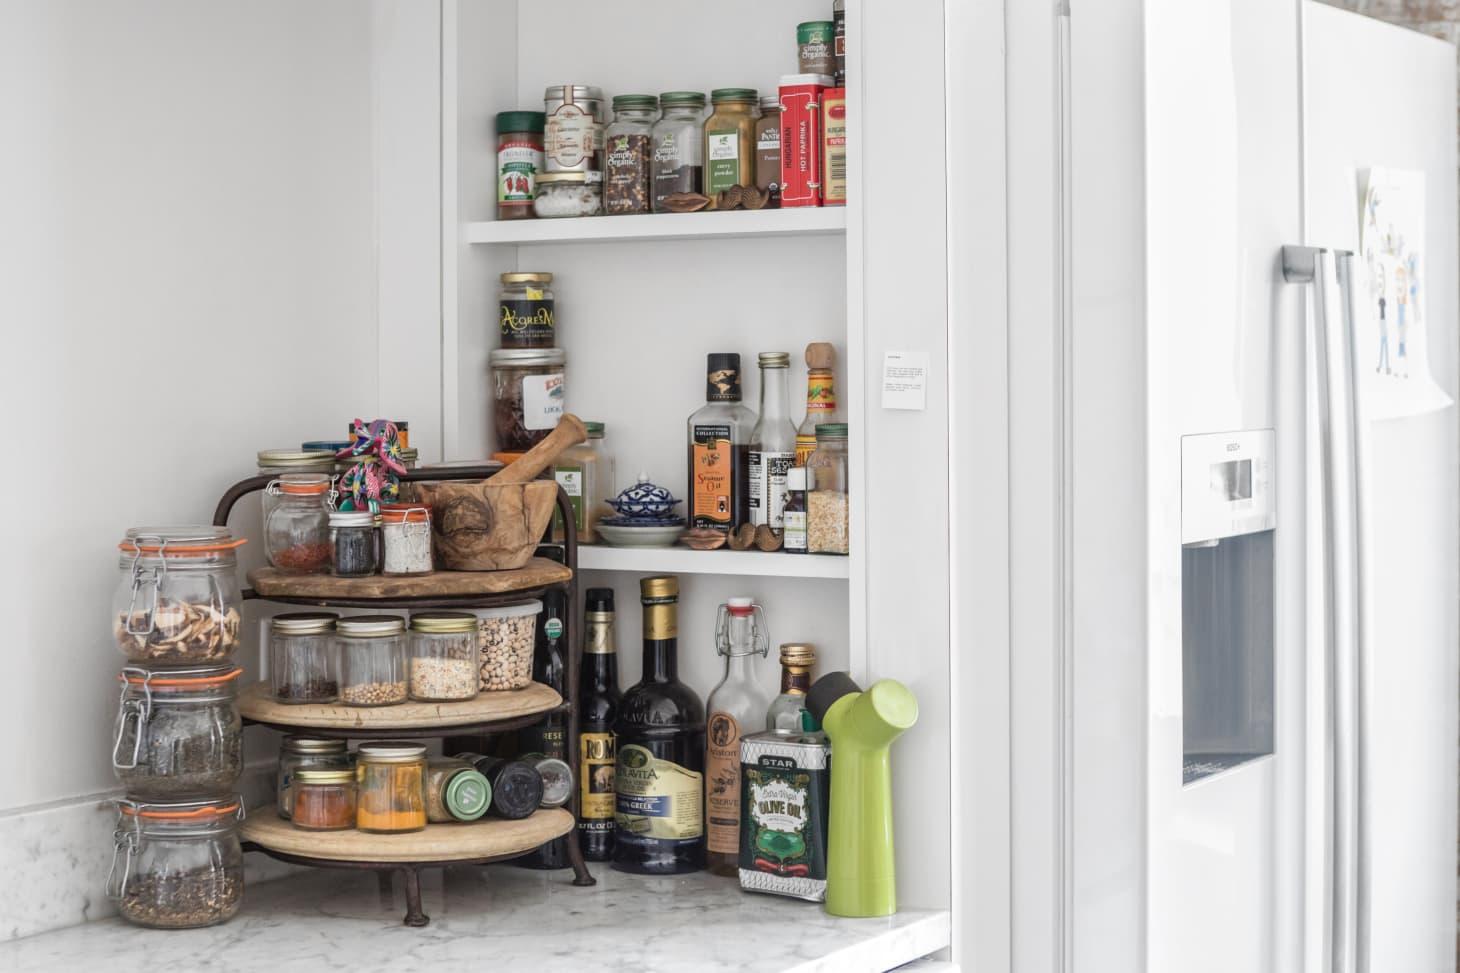 Storage Ideas for Small Kitchens | Kitchn - photo#19